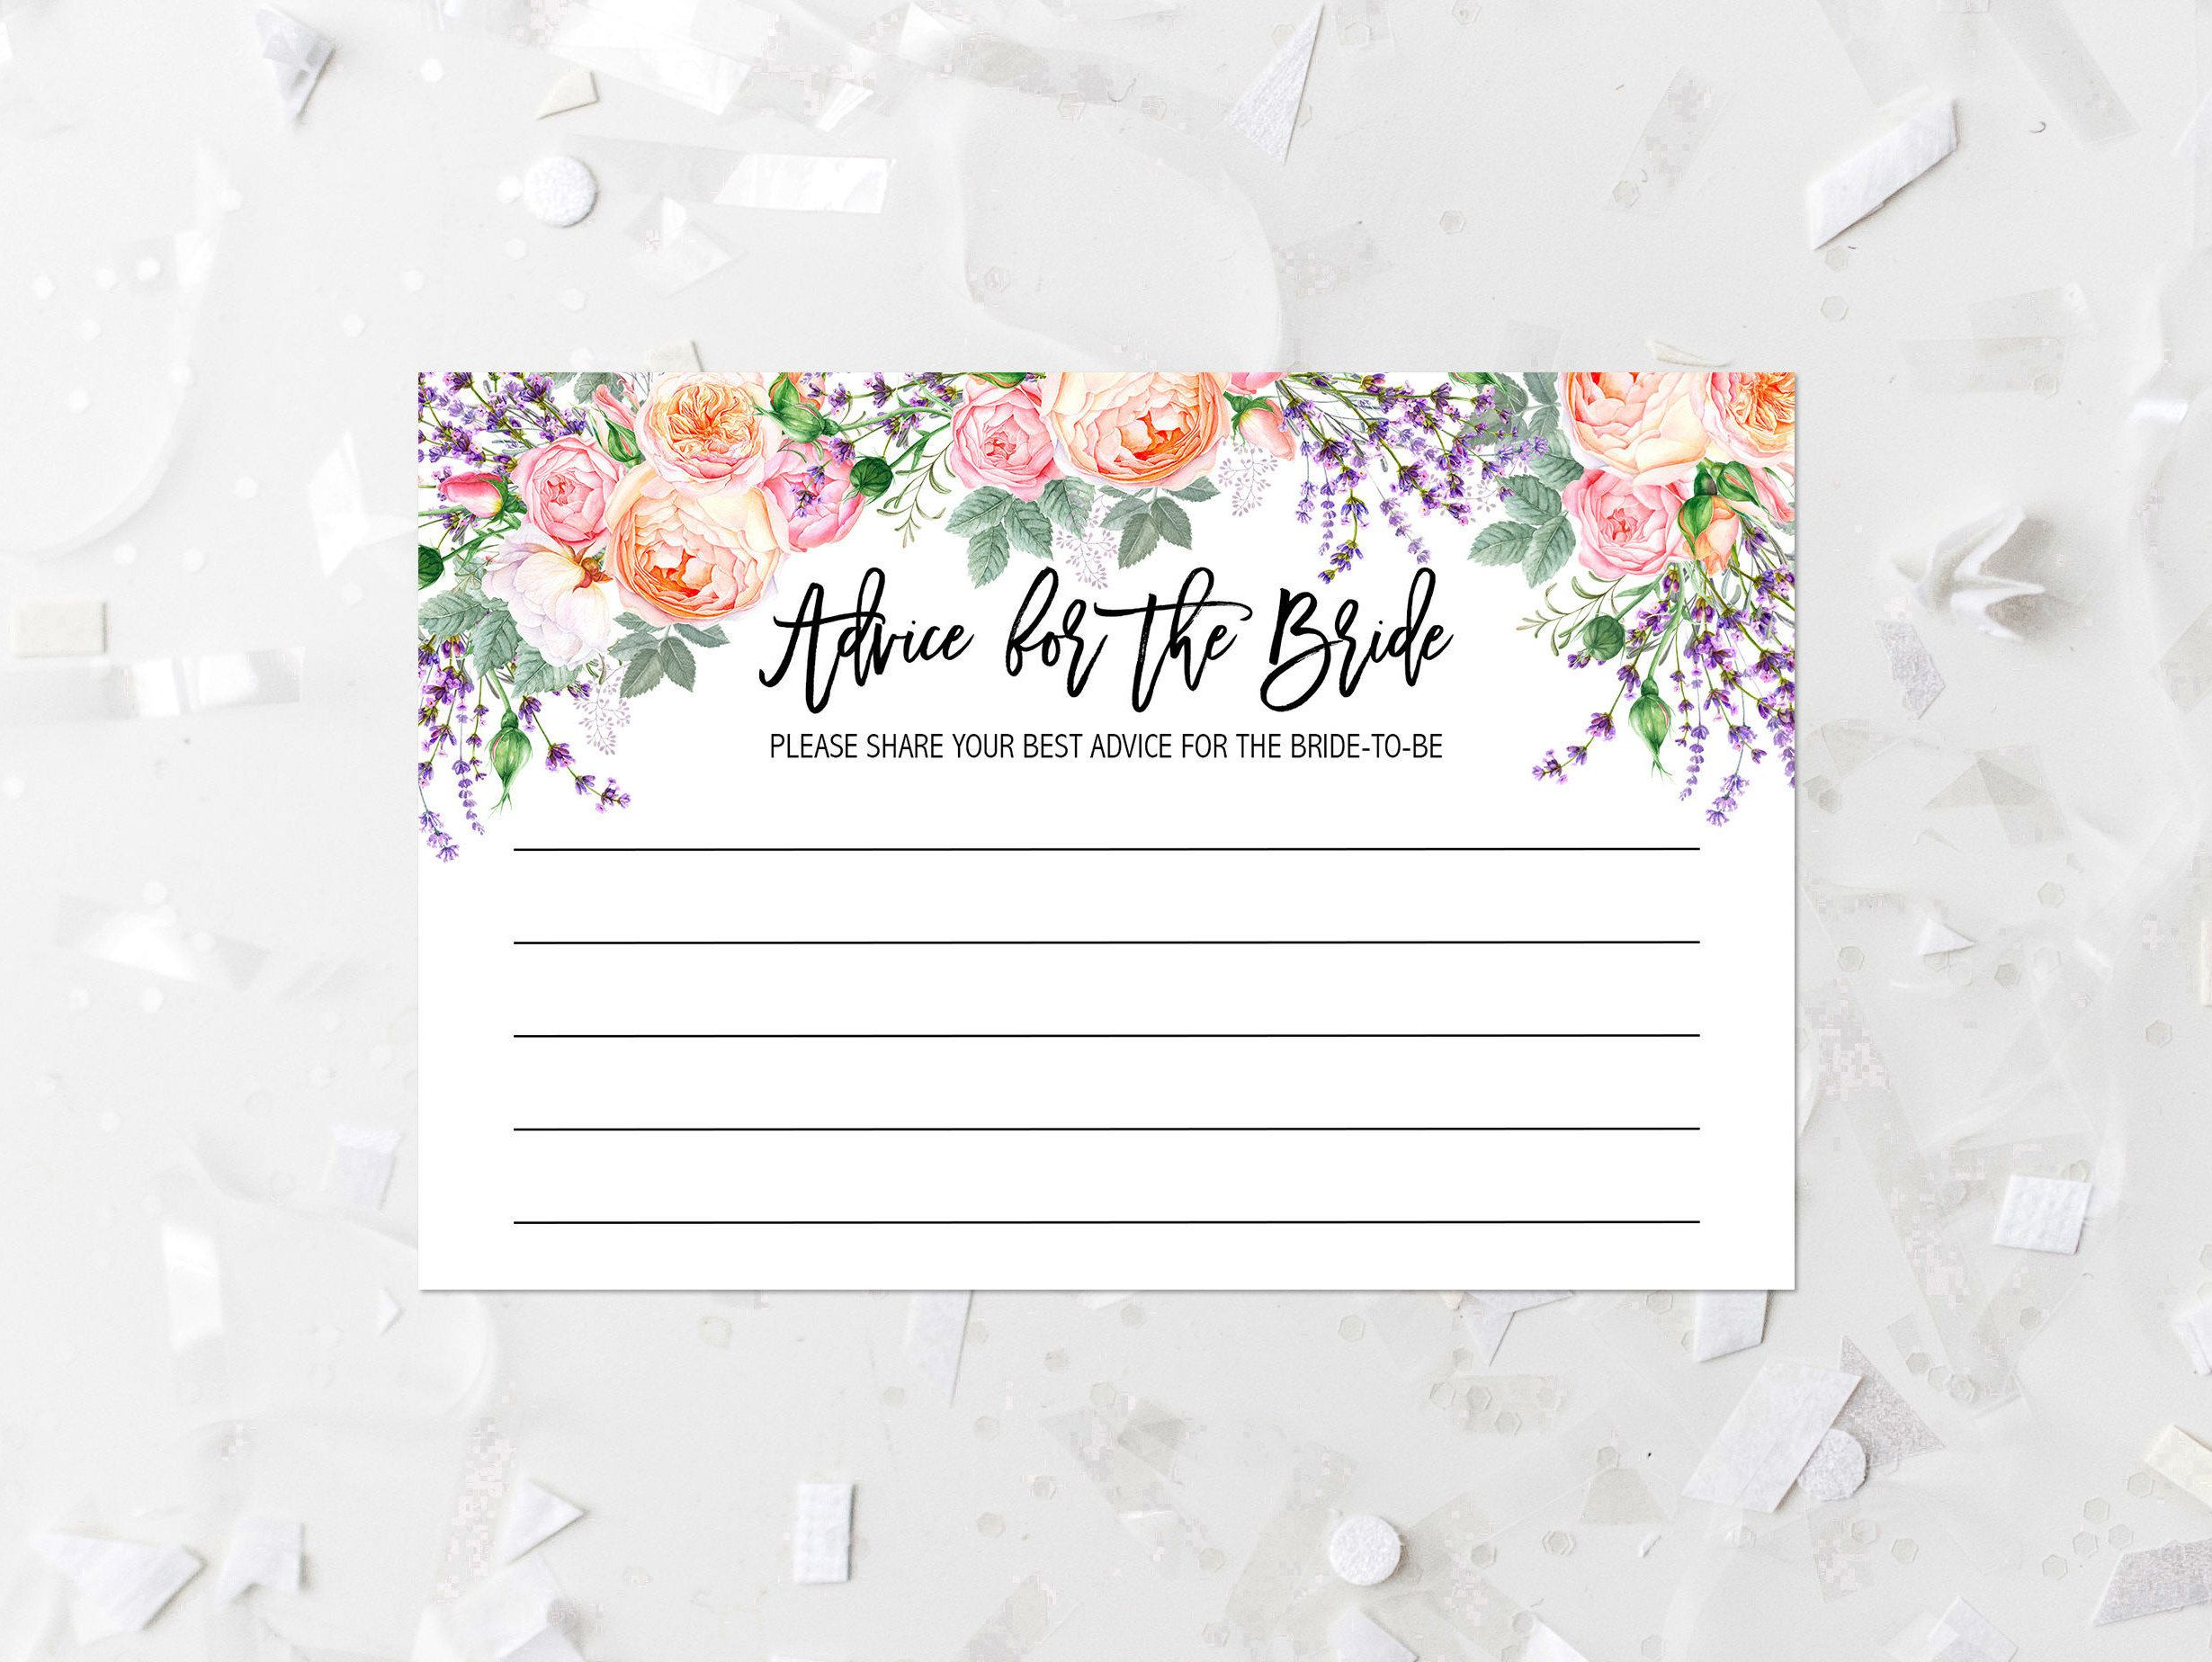 Floral Advice For The Bride Printable Spring Floral Bridal Shower